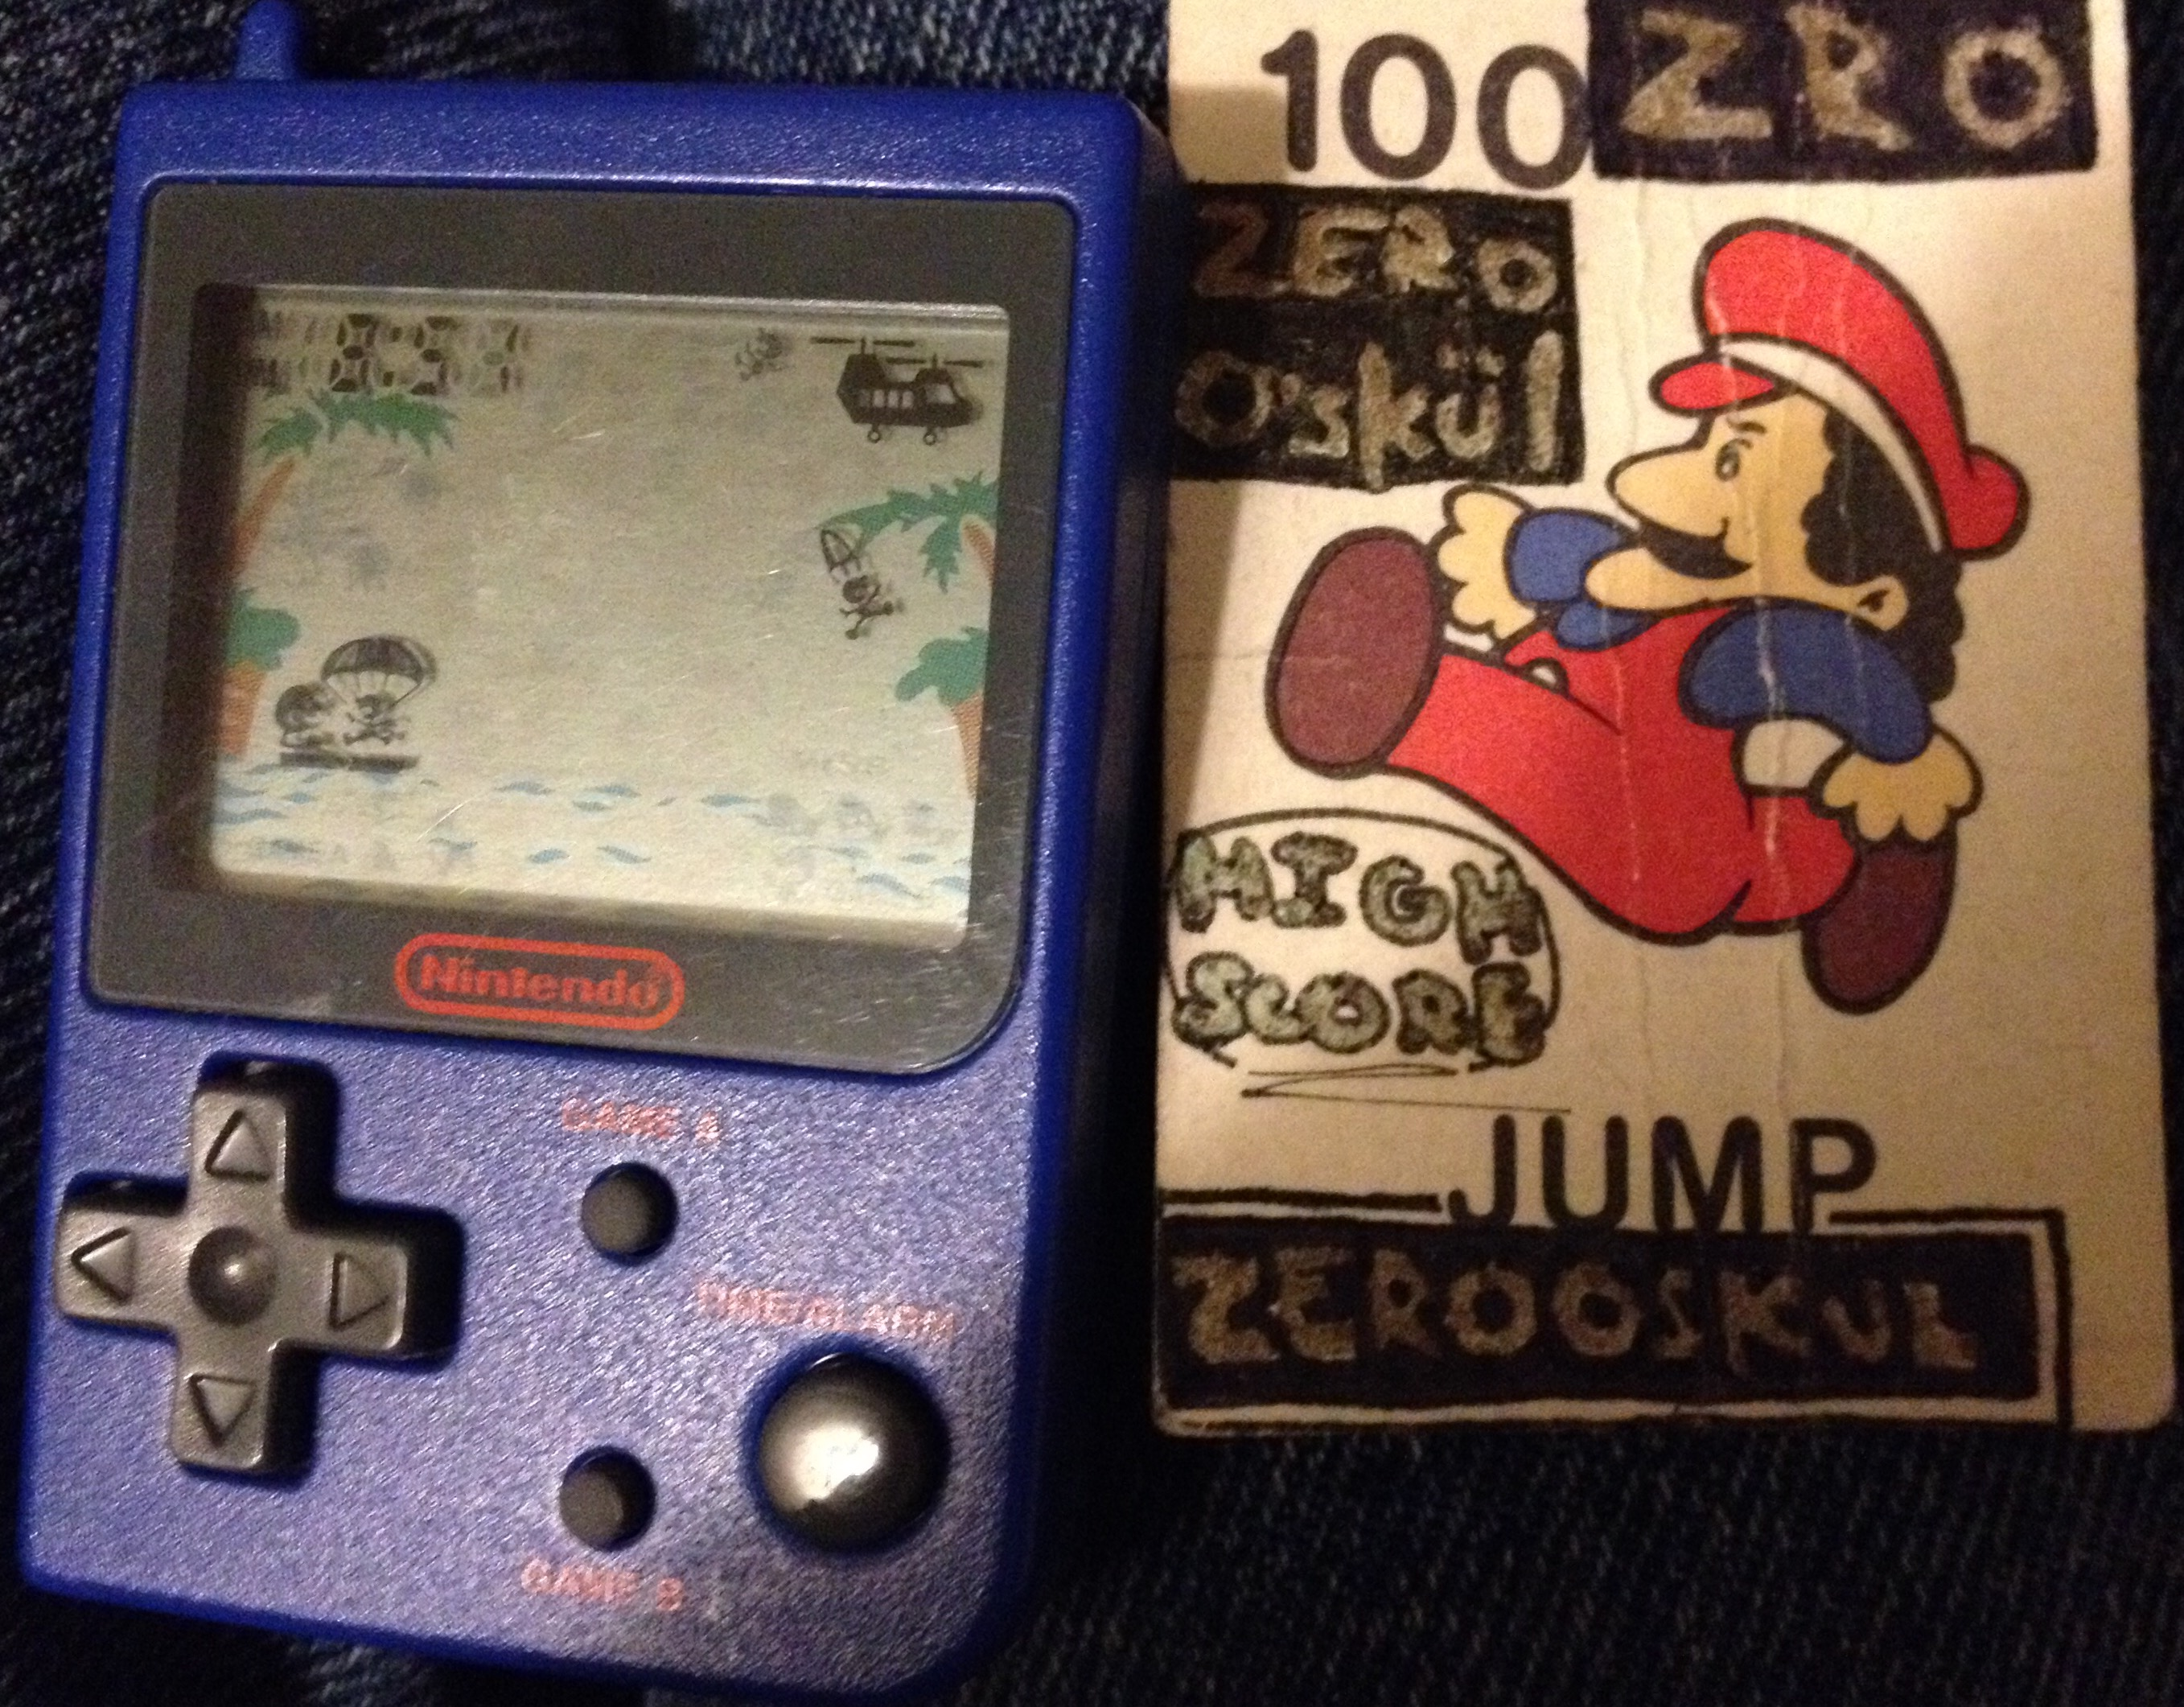 zerooskul: Nintendo Mini Classics: Parachute [Game A] (Dedicated Handheld) 778 points on 2019-06-20 19:50:38